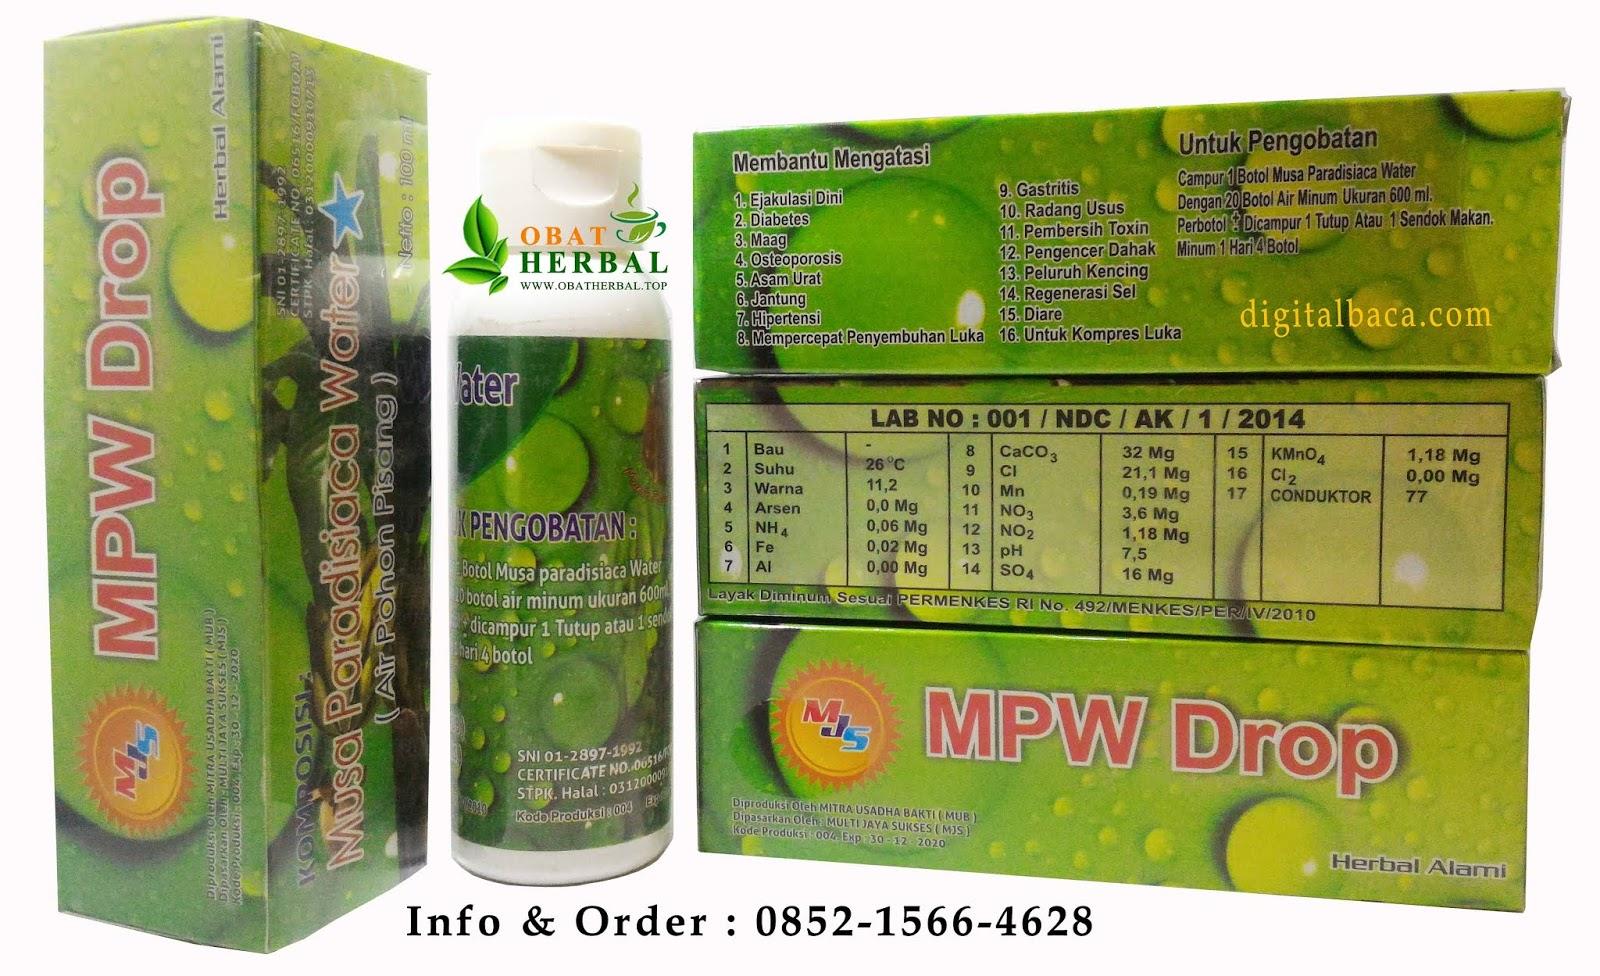 mpw drop, mpw bintang, biofresh mpw, multi jaya sukses, hta herbal, bacem oil,